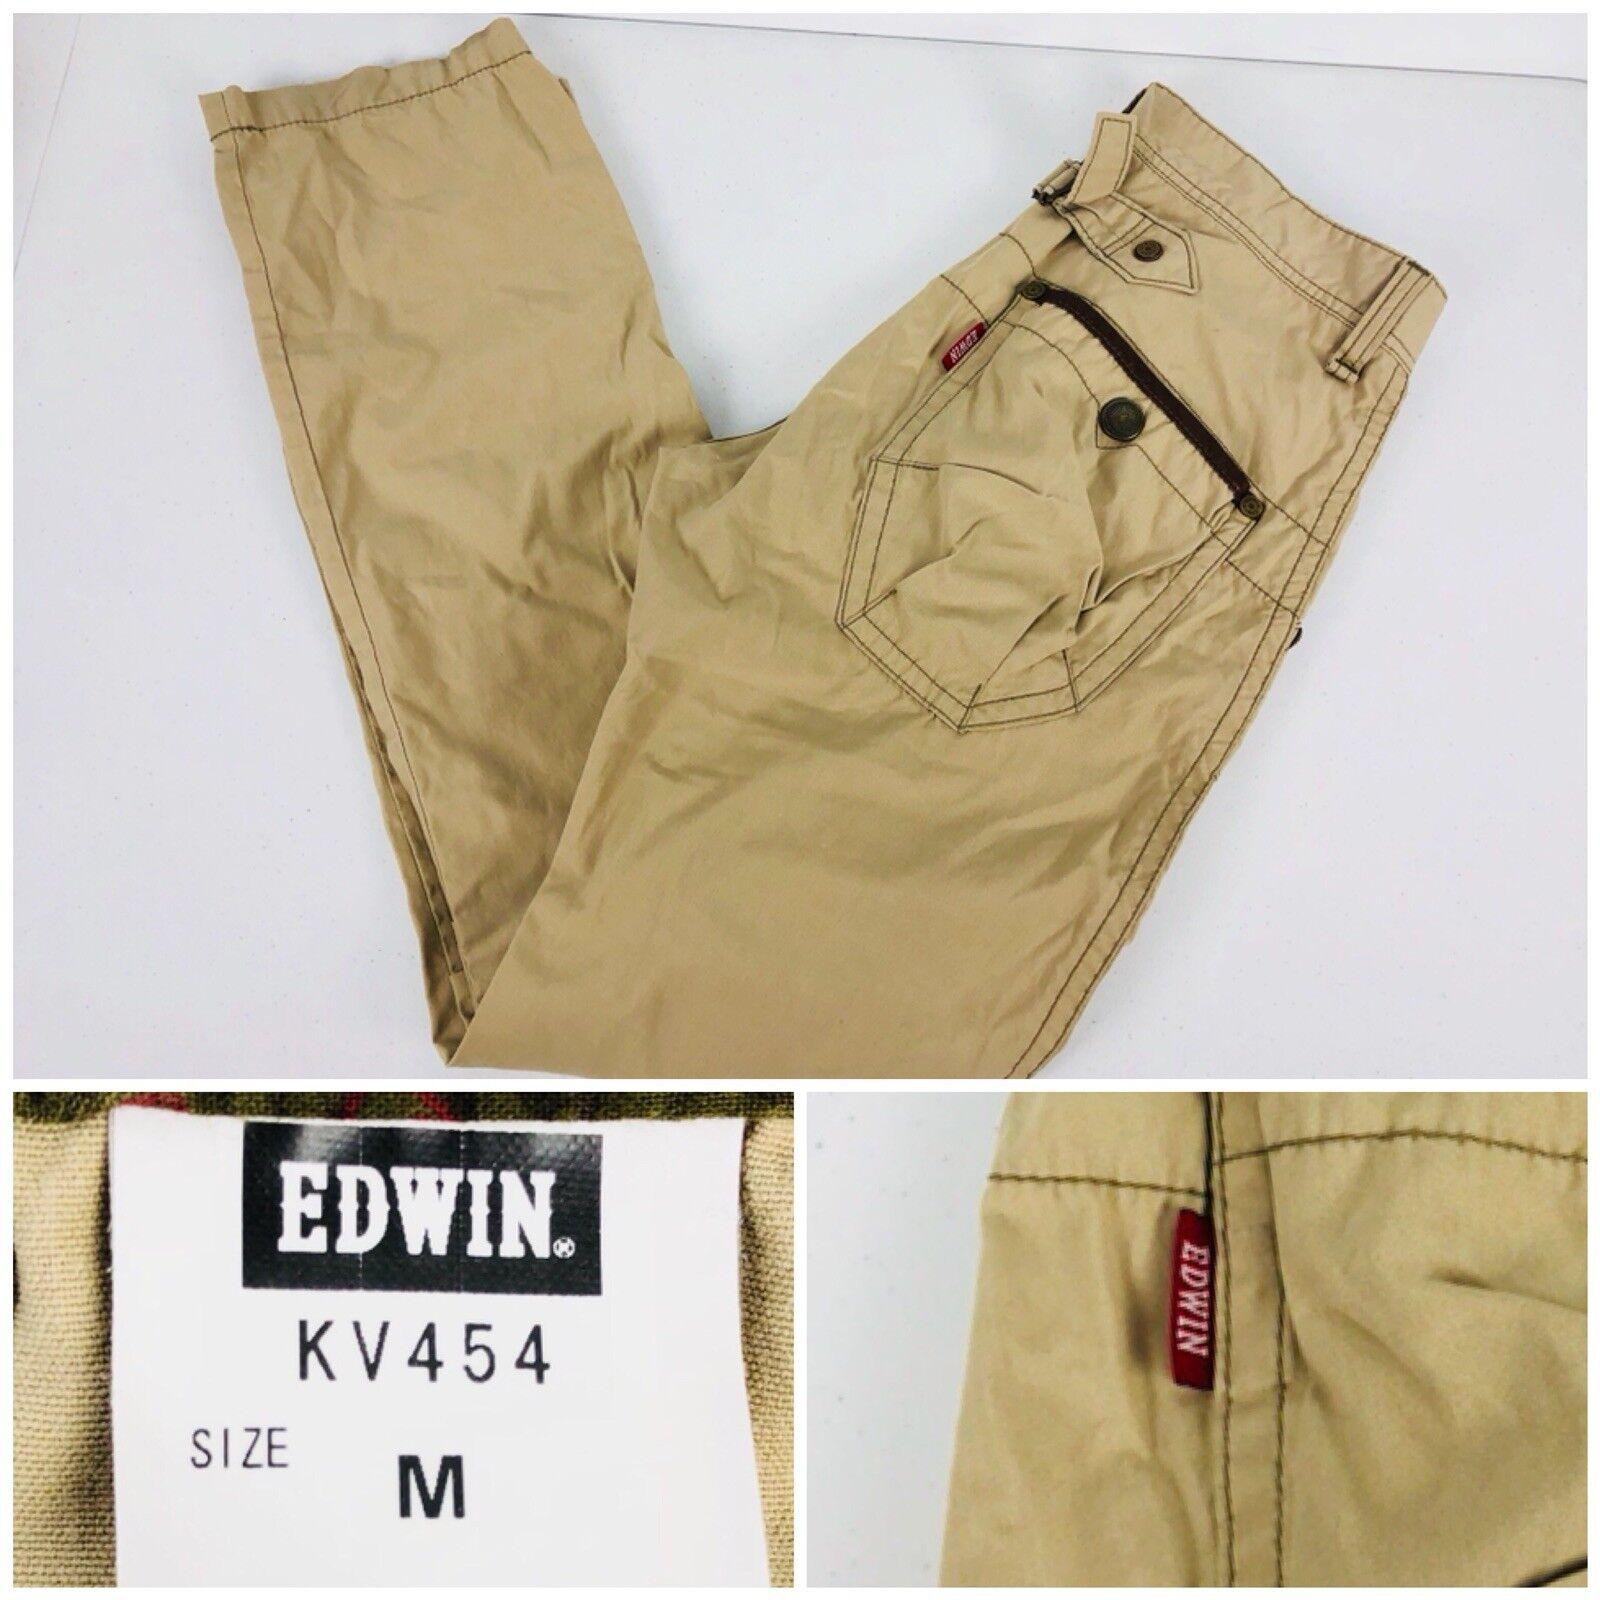 EDWIN Mens Medium Baker Pants XV Khaki Cotton Blend Exclusive Vintage